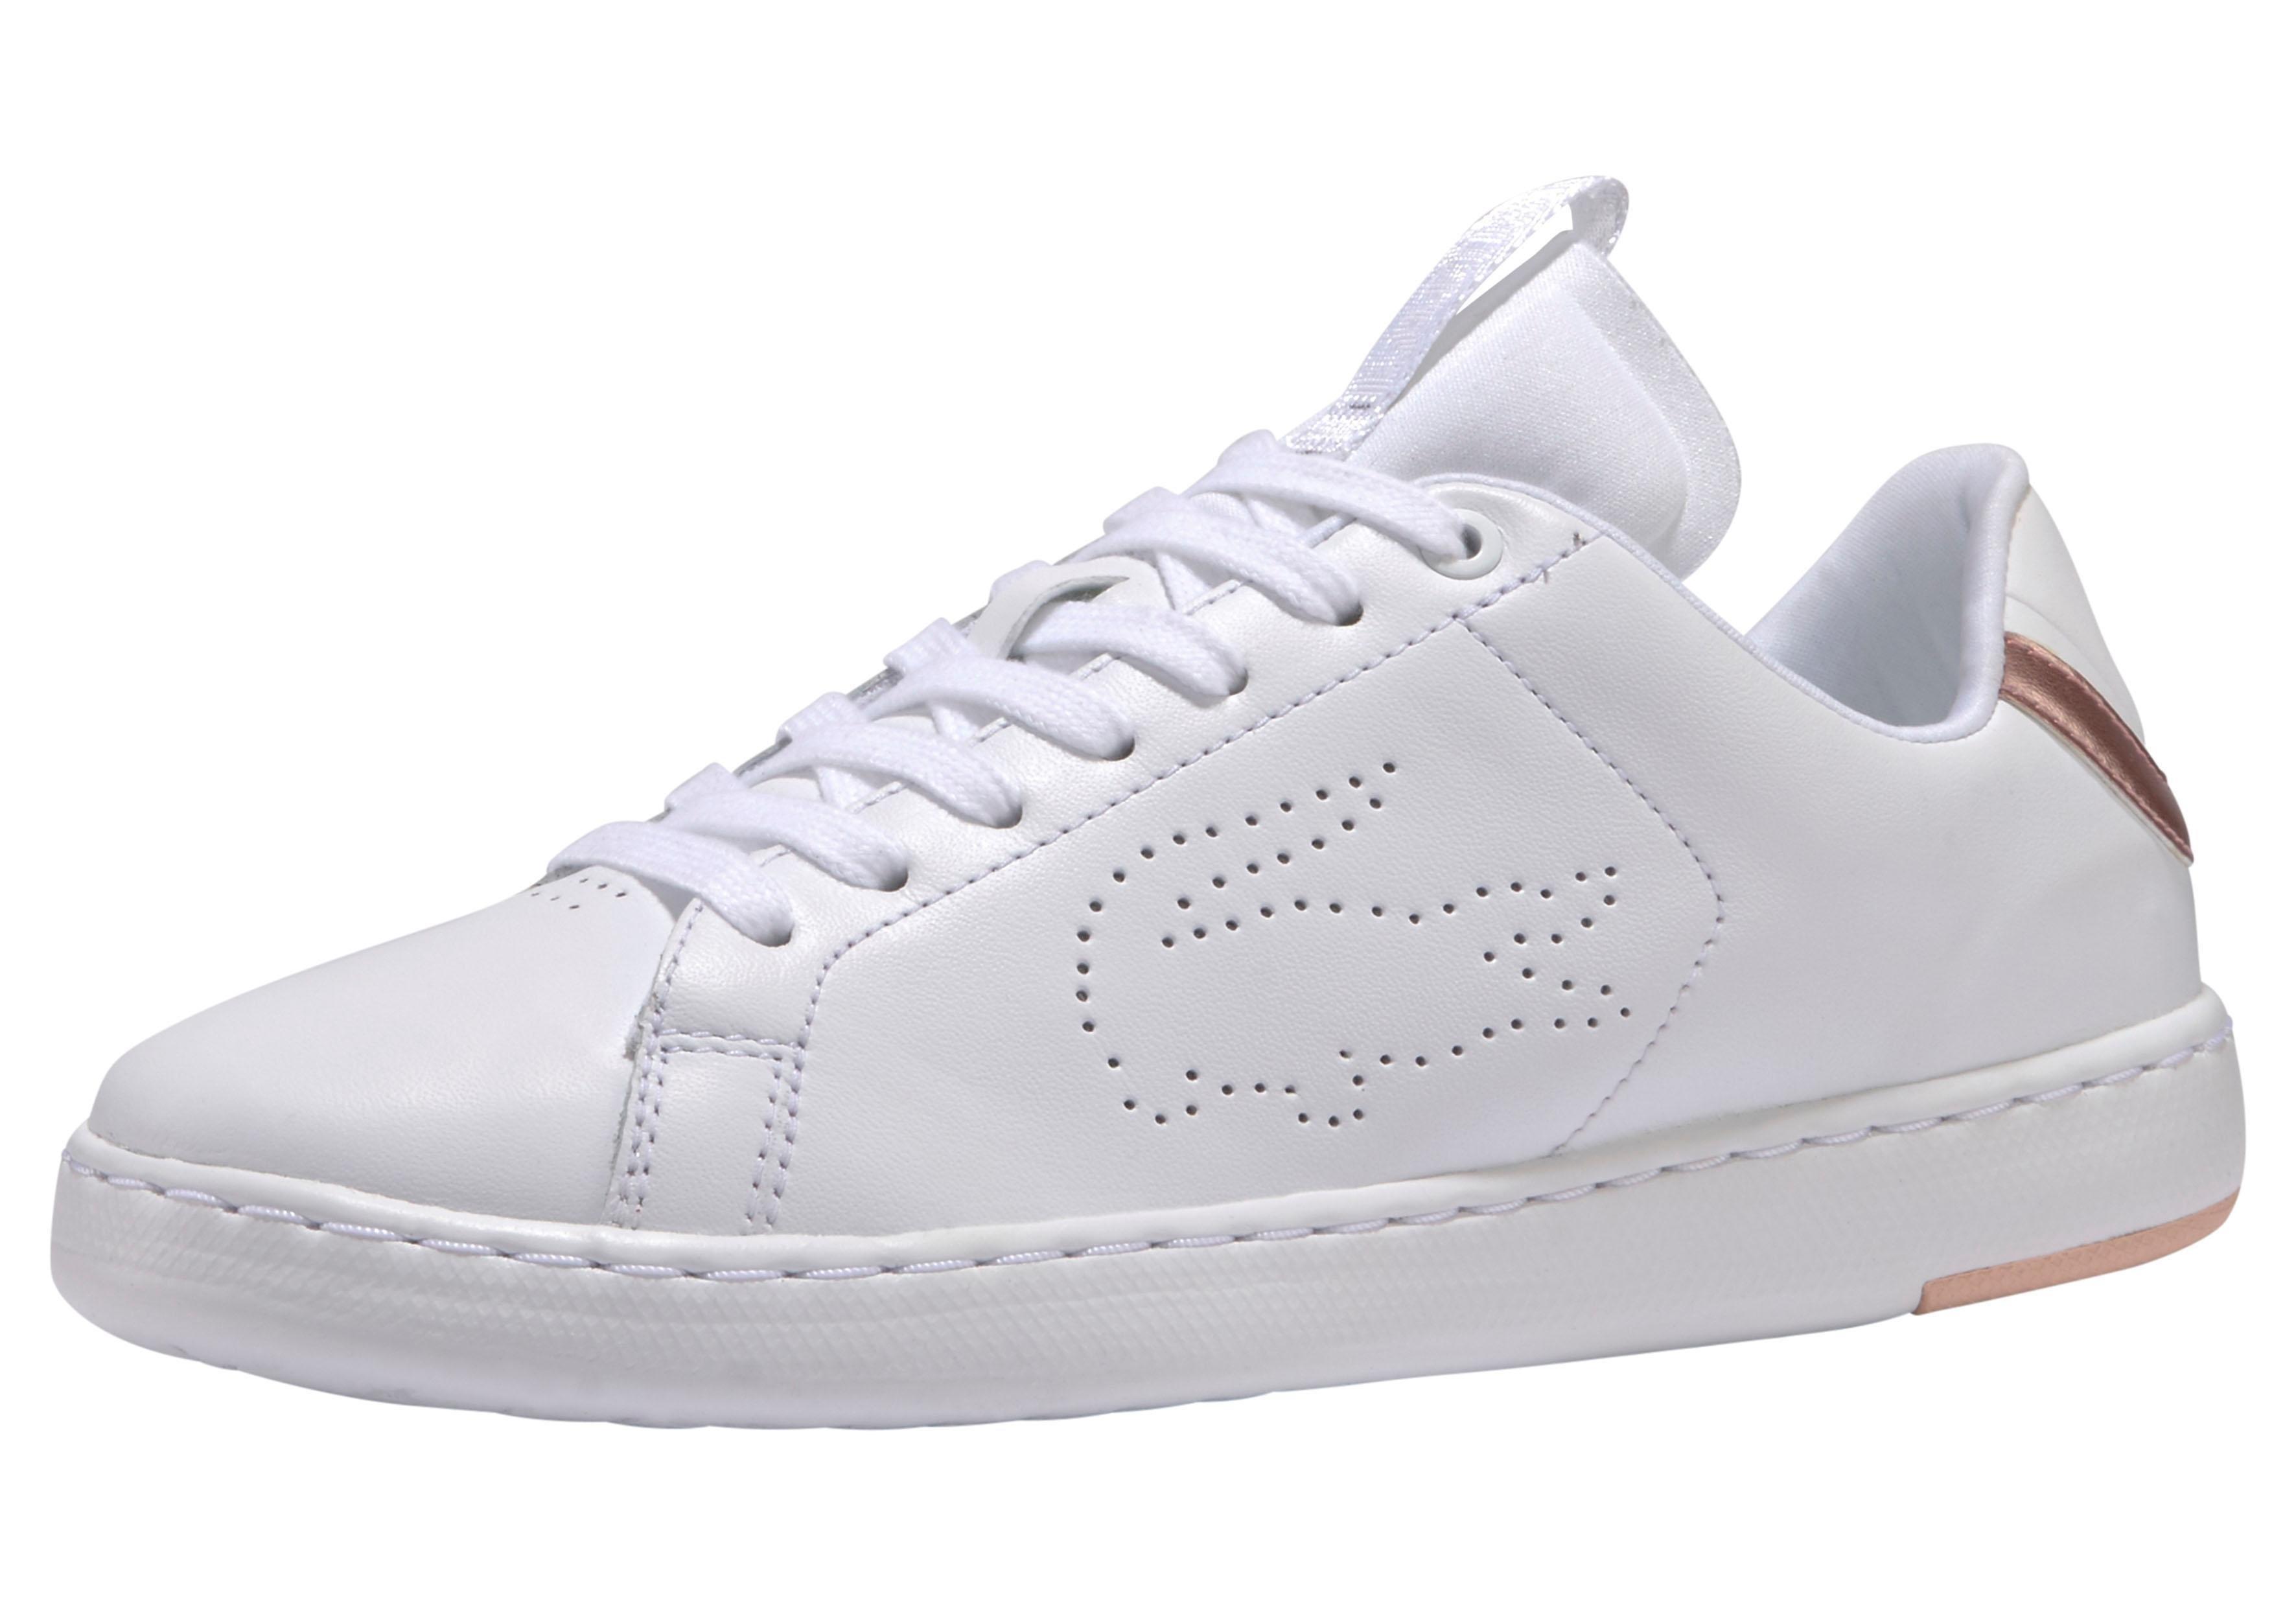 LACOSTE sneakers »Carnaby Evo Light WT 119« - verschillende betaalmethodes